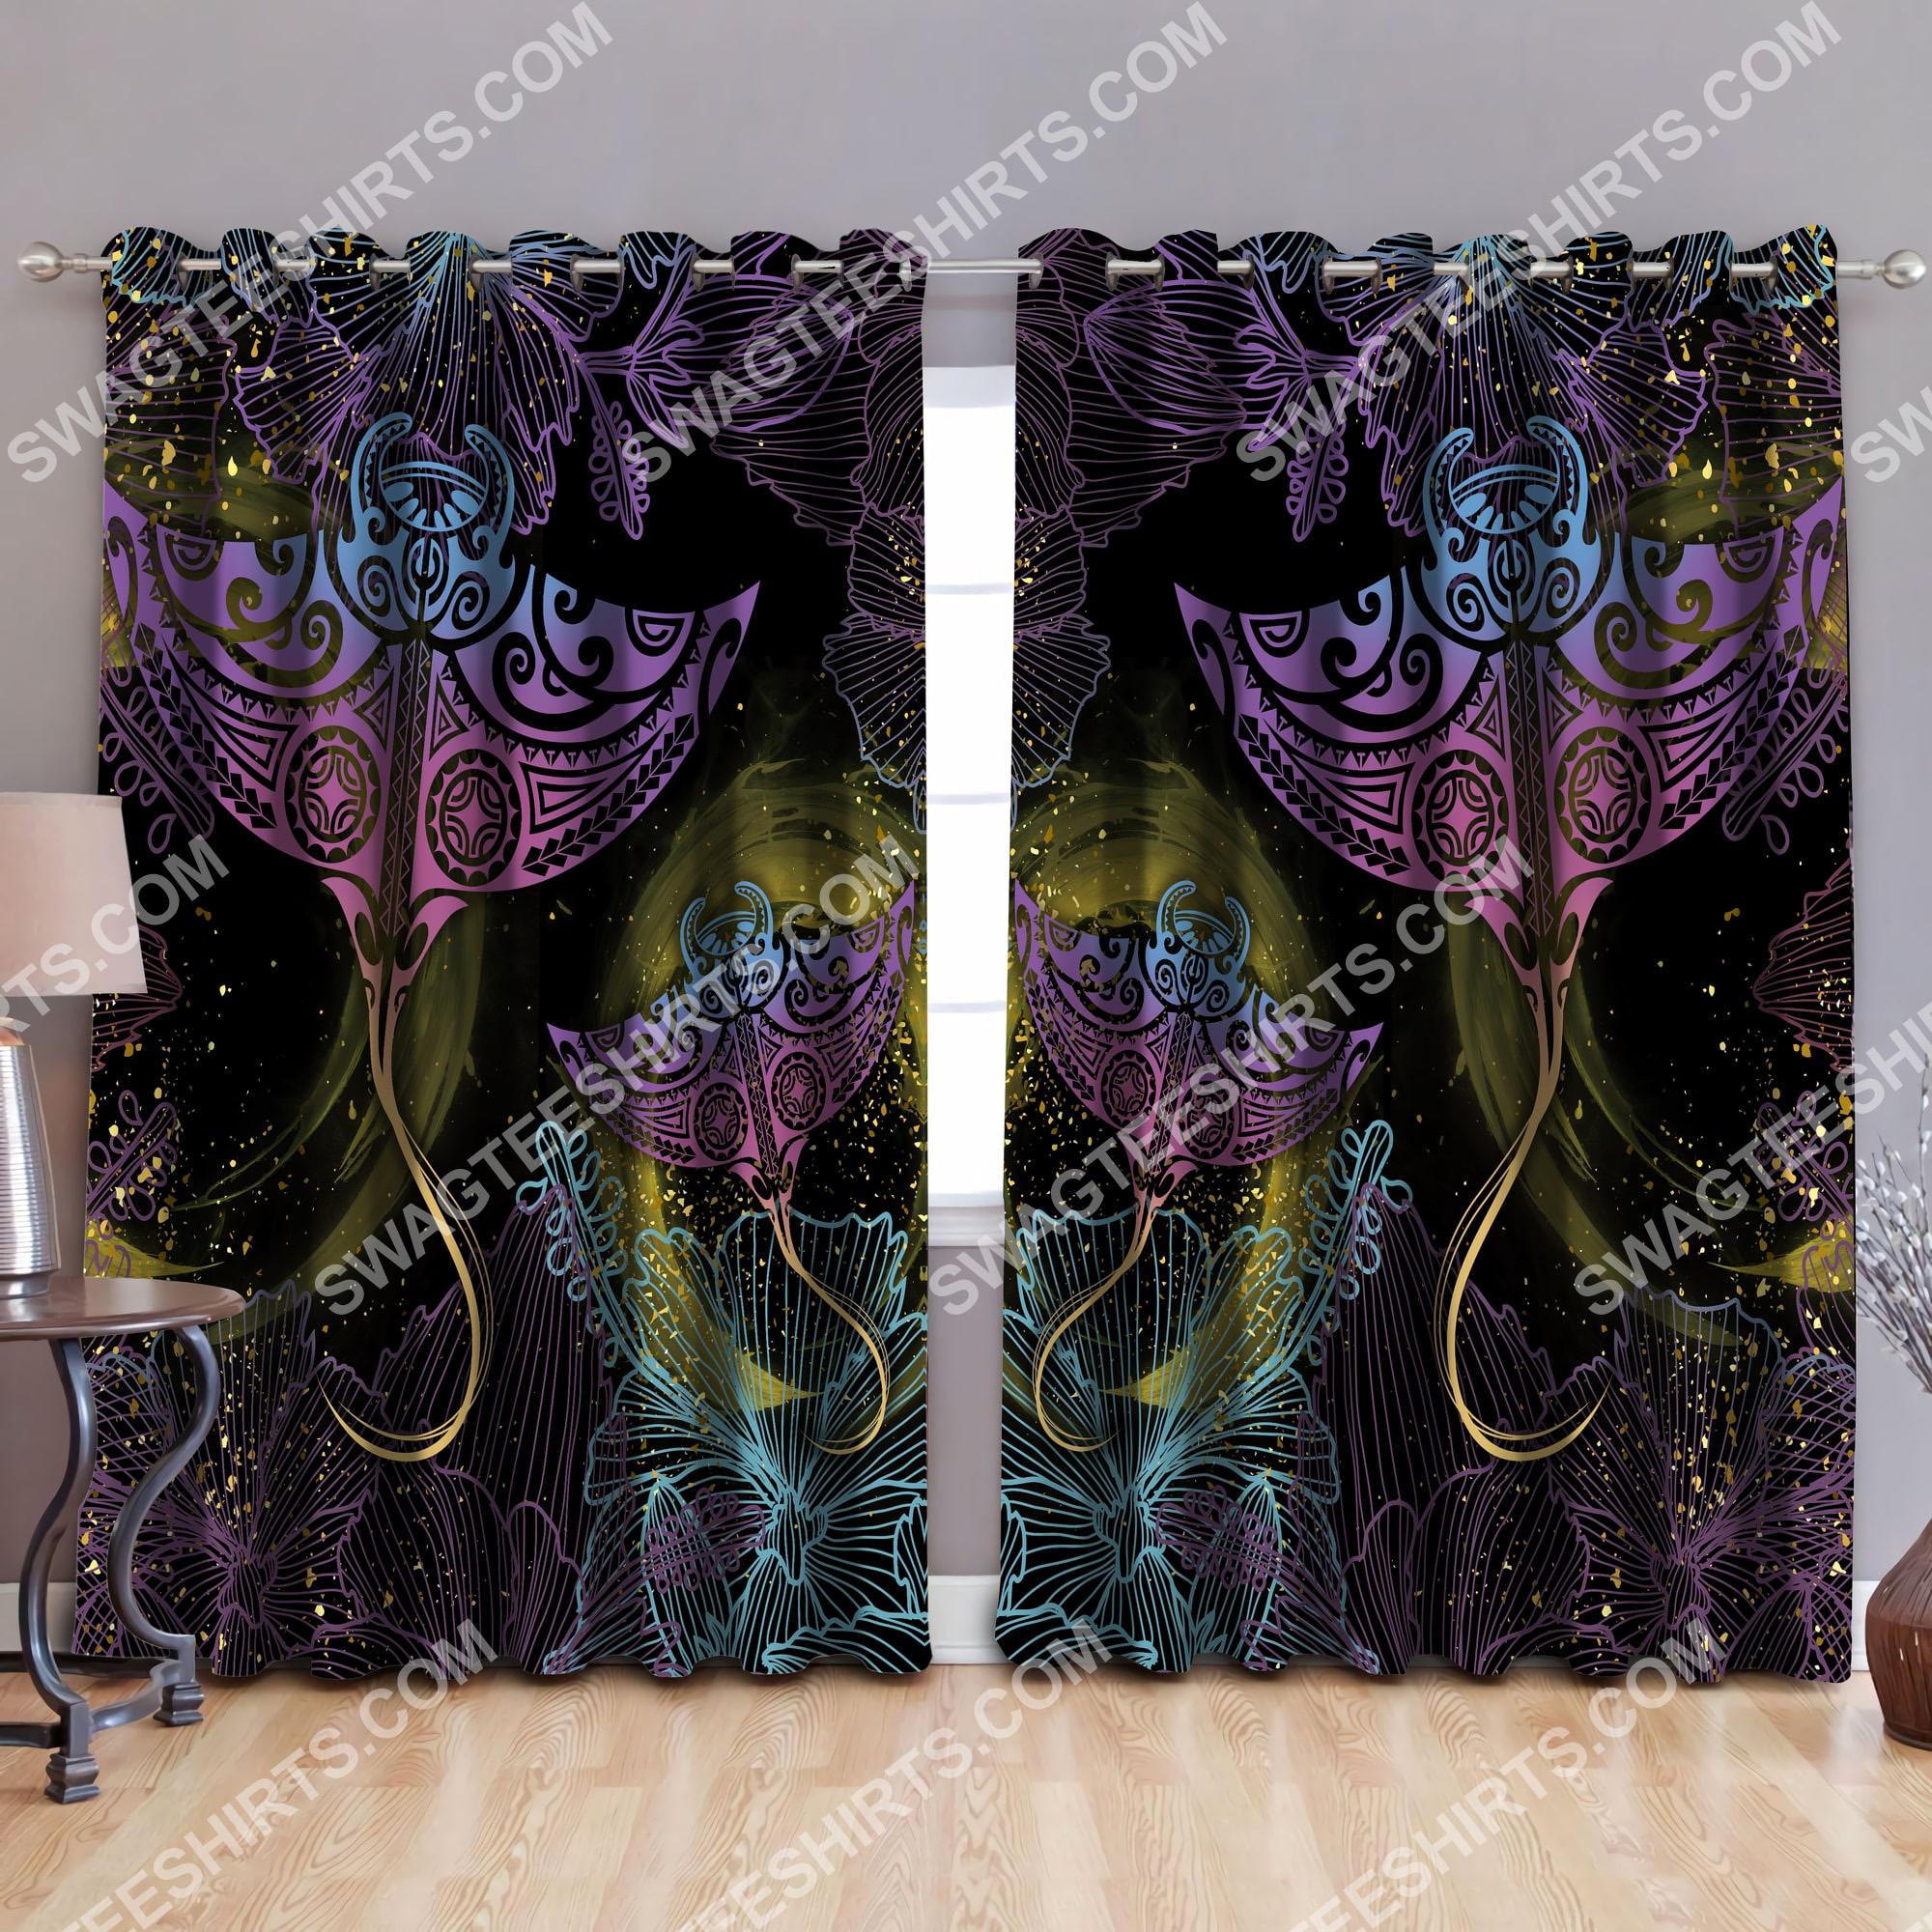 polynesian beautiful ray galaxy all over printed window curtains 2(1)